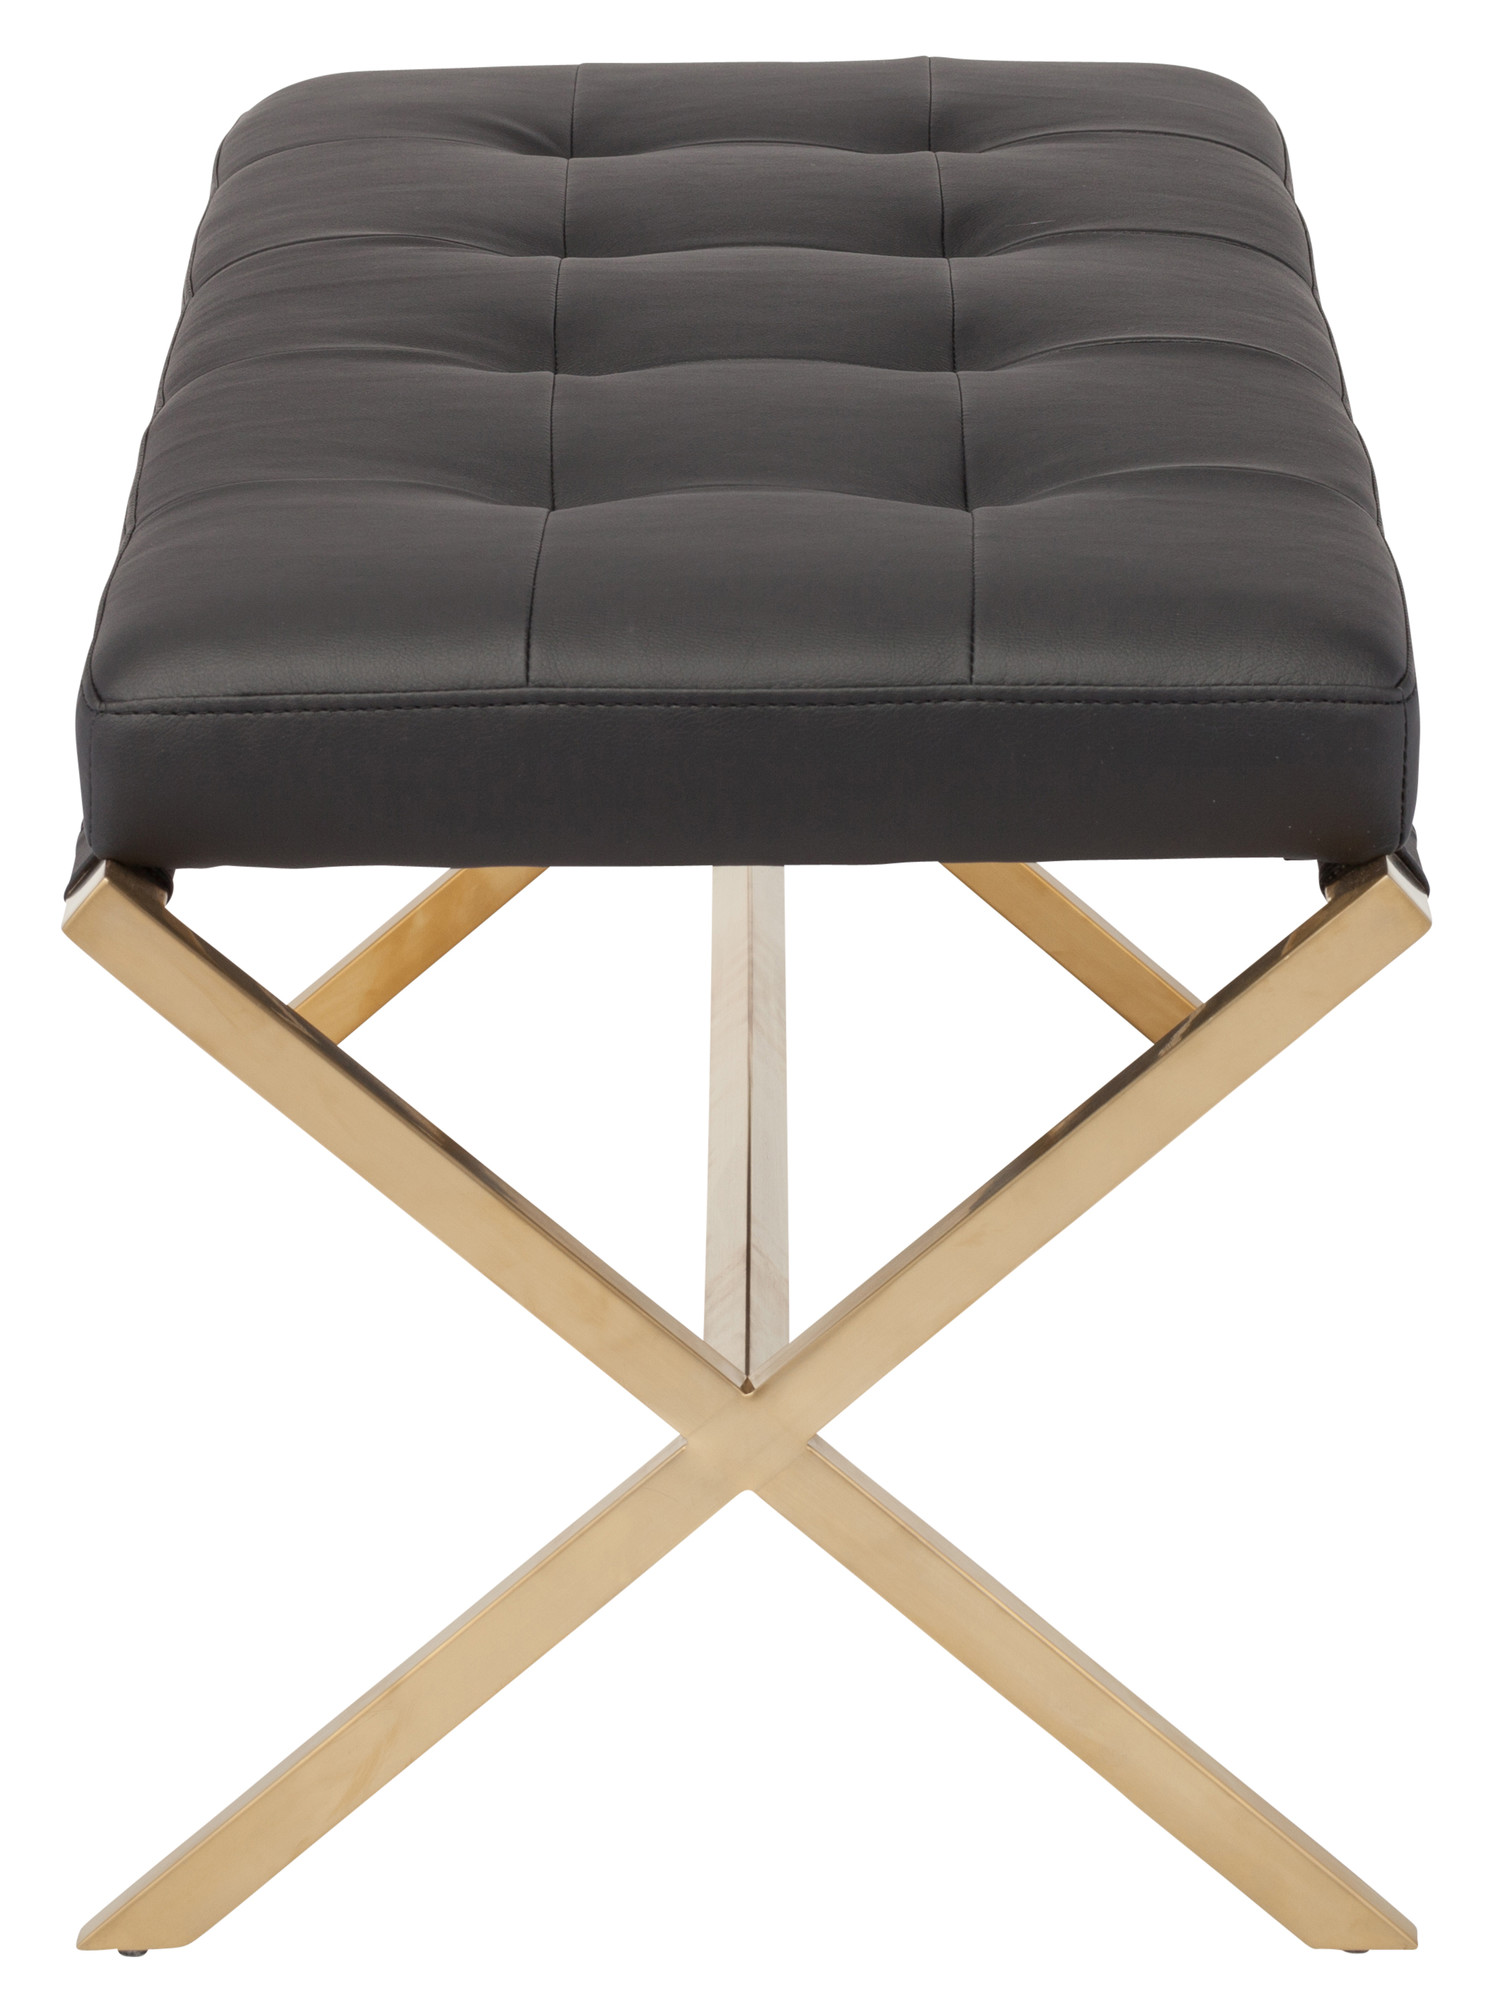 auguste-upholstered-bench-nuevo.jpg